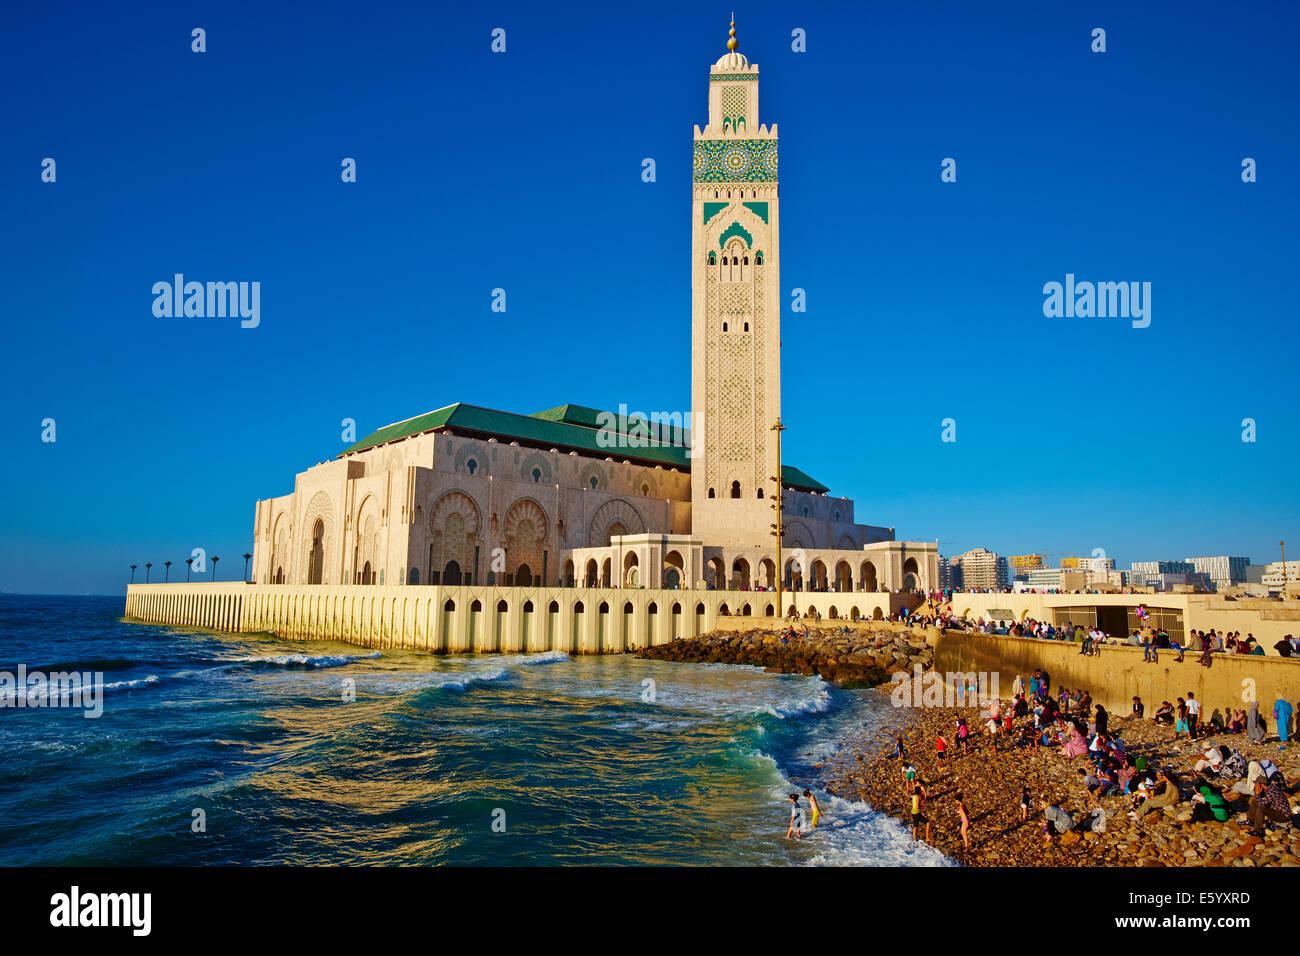 Marruecos, Casablanca y mezquita de Hassan II Foto de stock